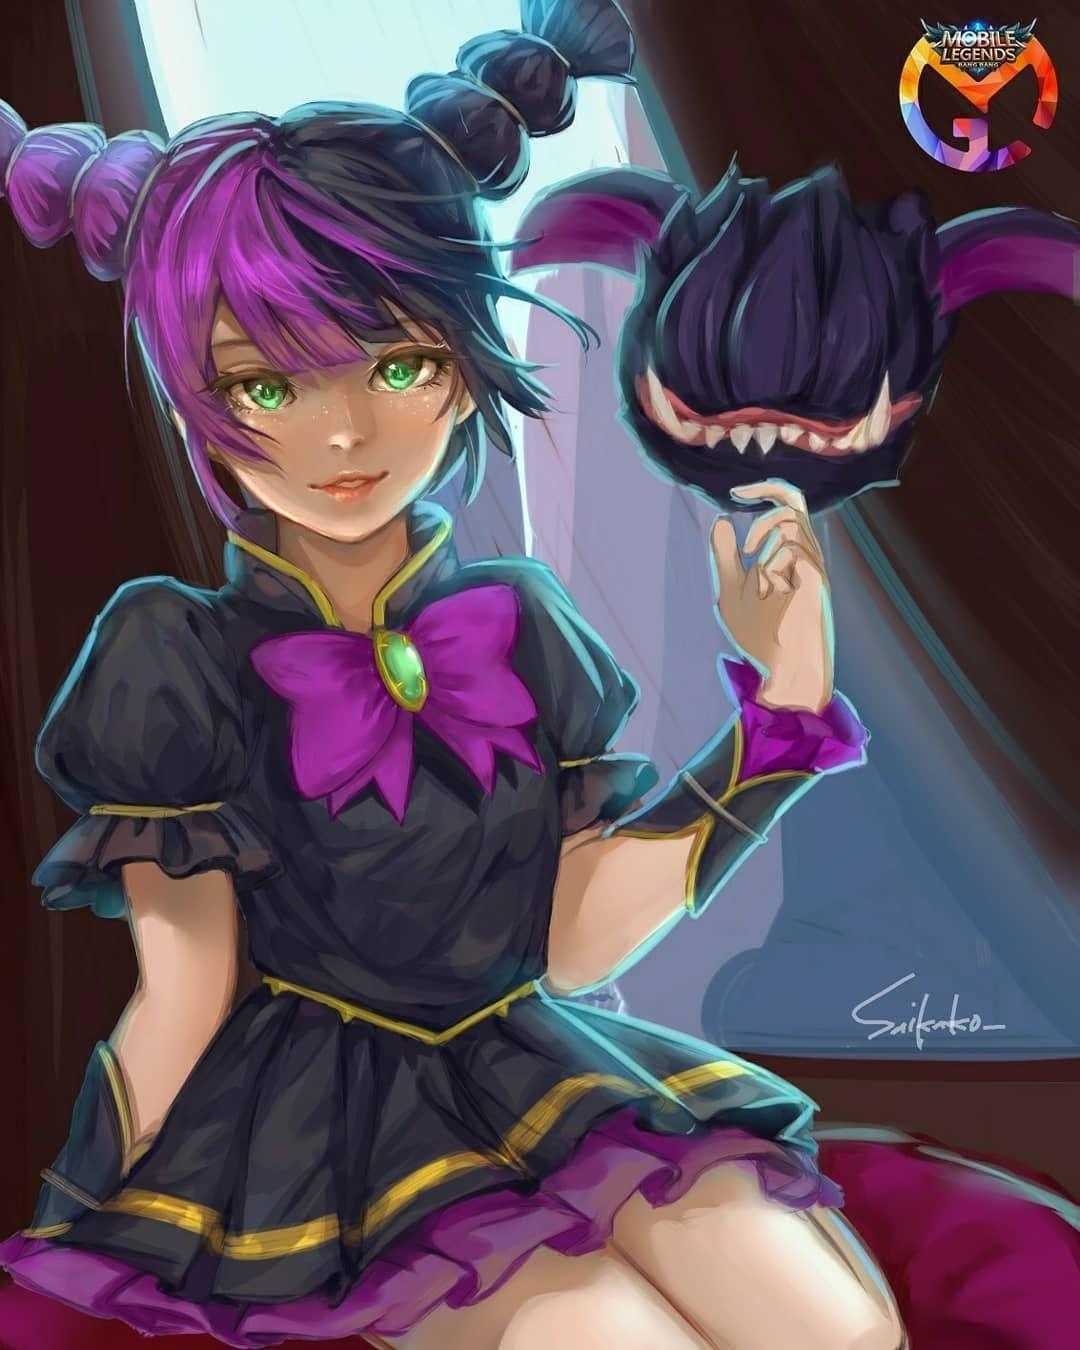 Adults Are So Boring I Don T Want To Grow Up Lylia Official Mgl Fanart The Upcoming Hero Lylia Mg Desain Karakter Game Gambar Karakter Animasi